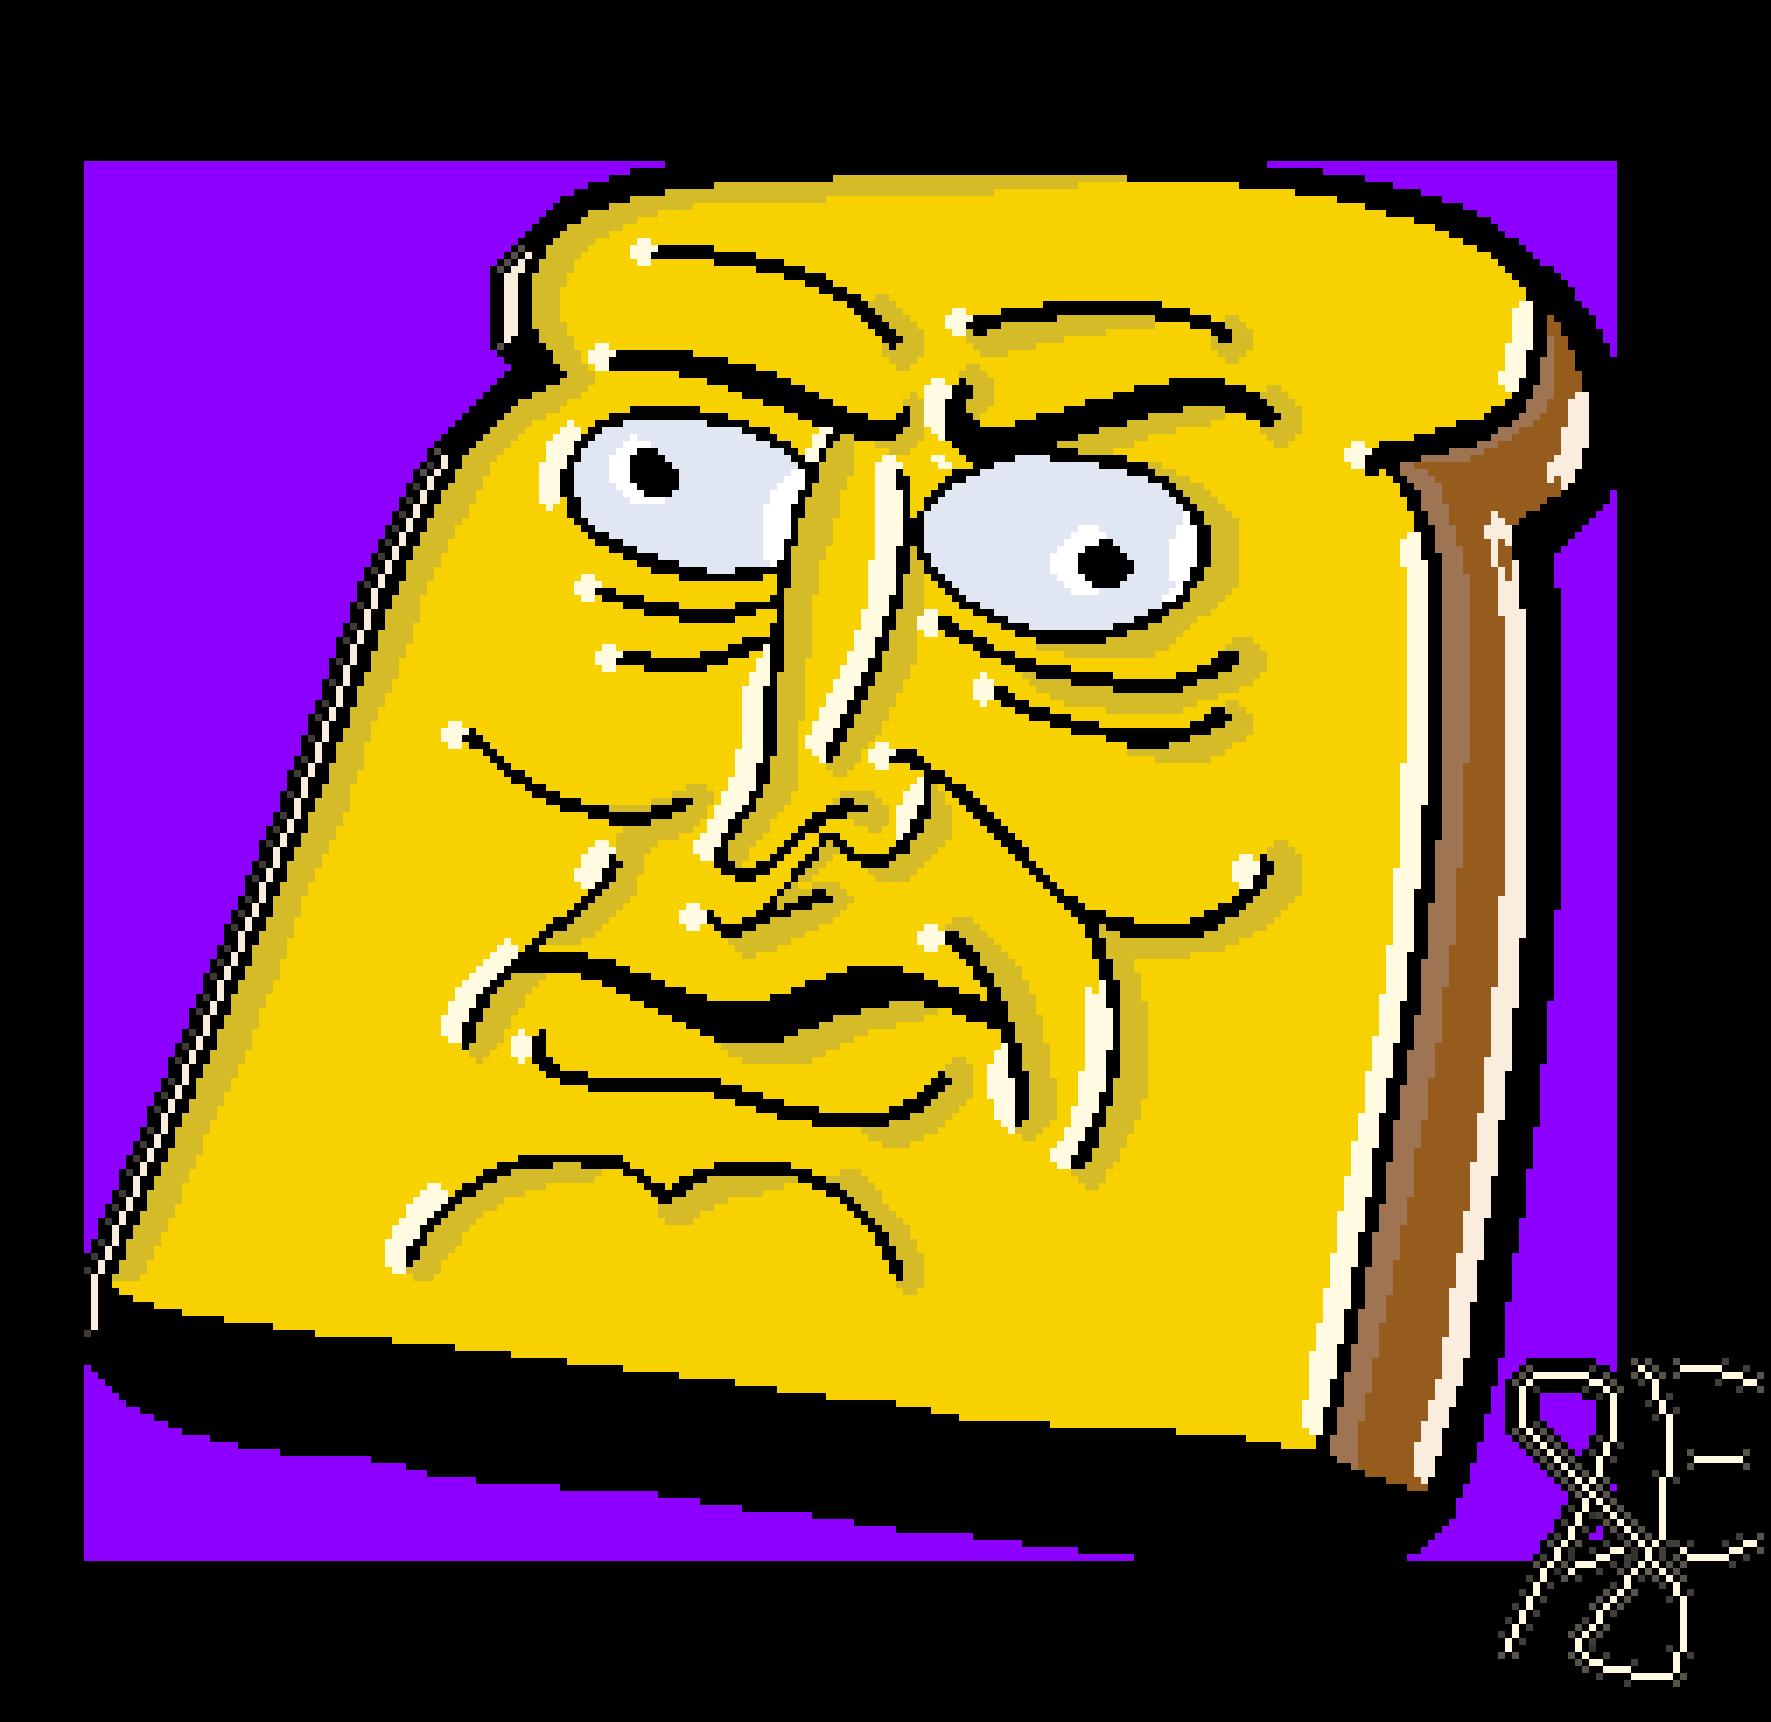 Powdered Toast Man's head